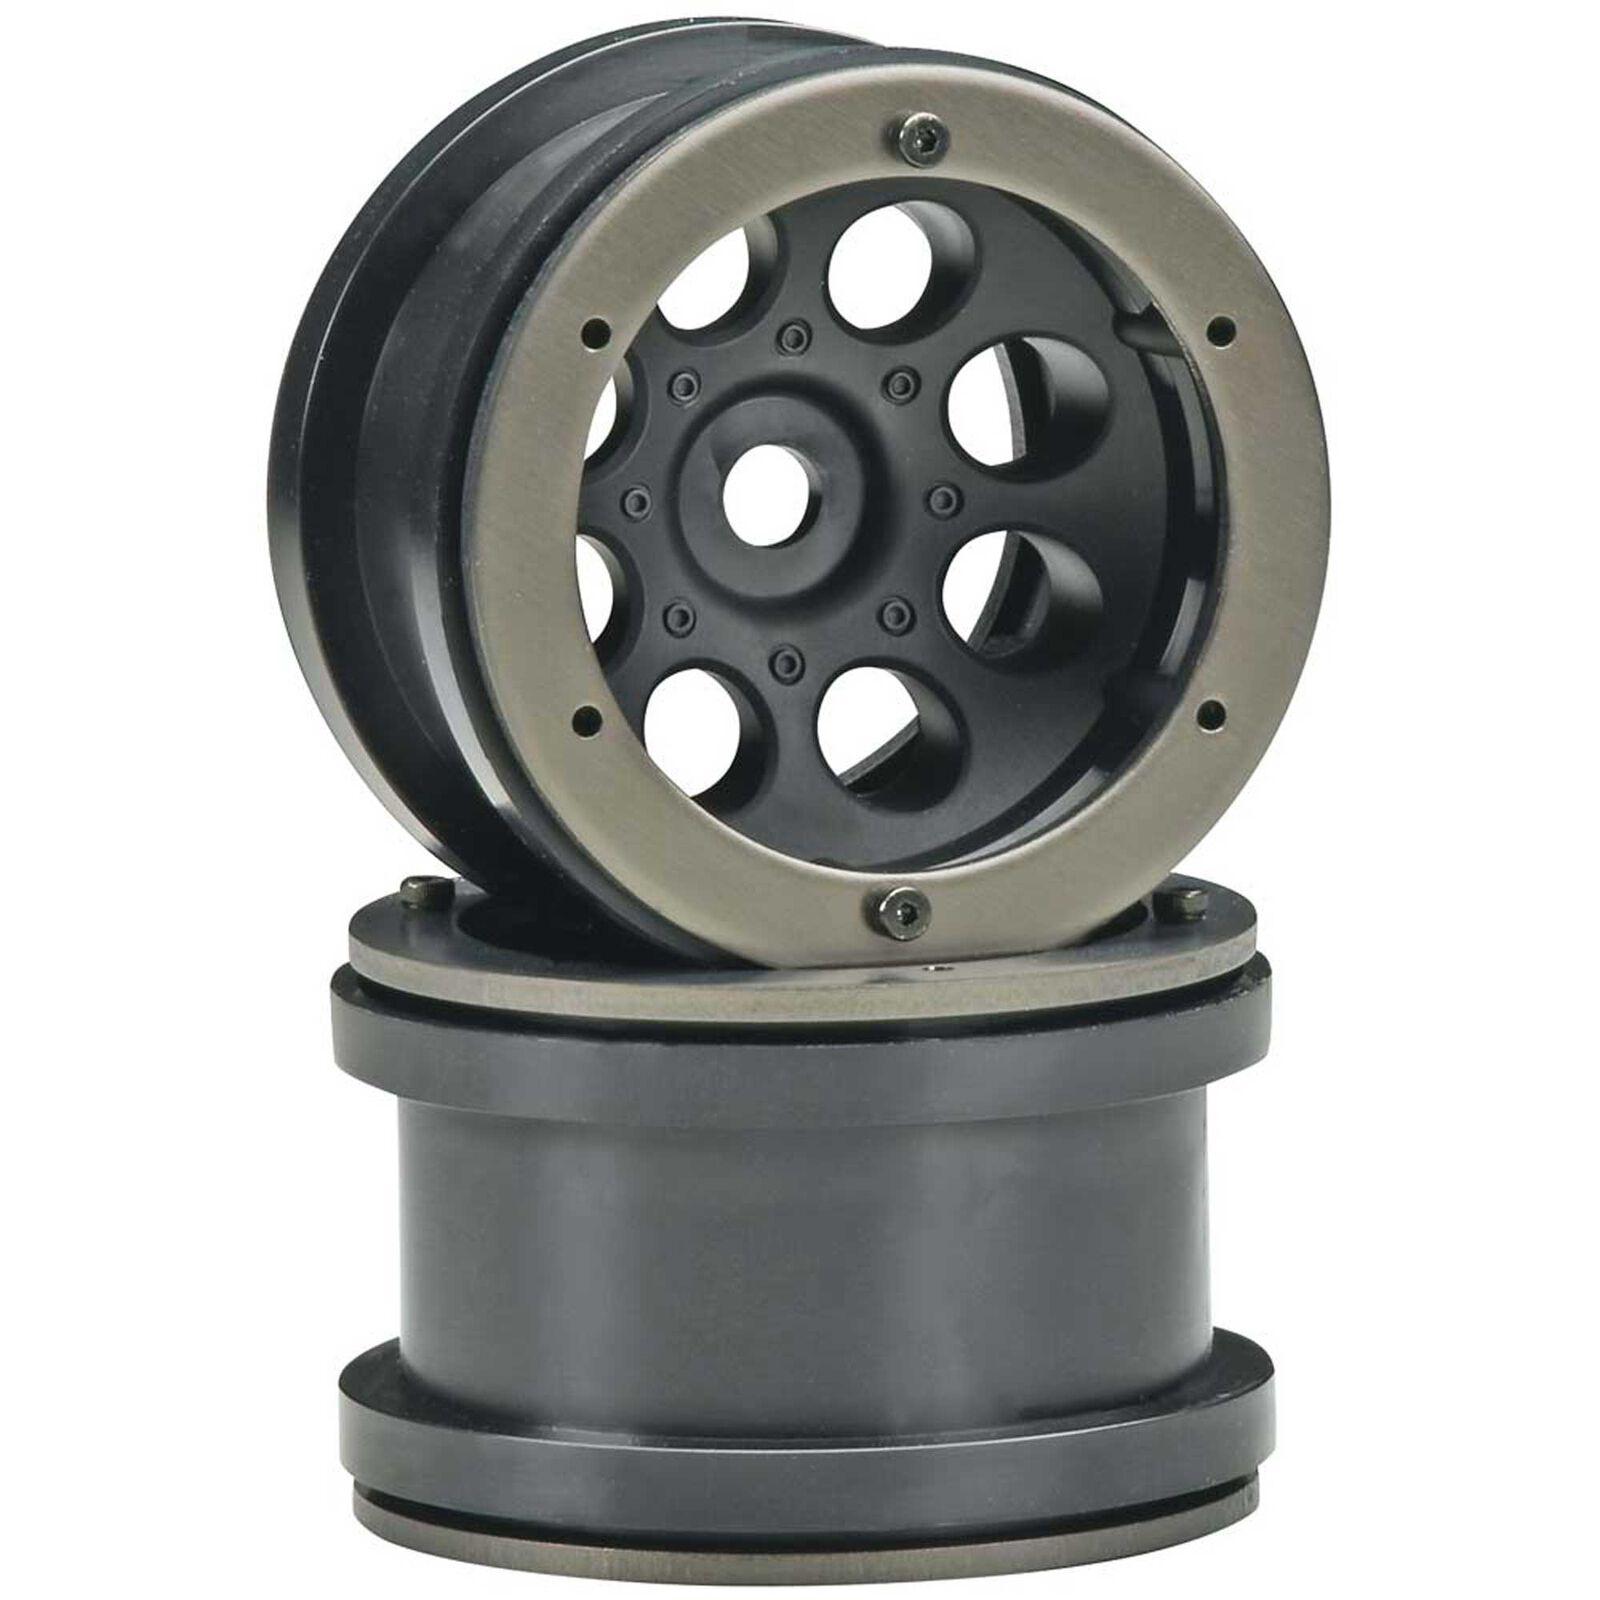 1/10 8-Hole 2.2 Beadlock Wheels, 12mm Hex, Black (2)